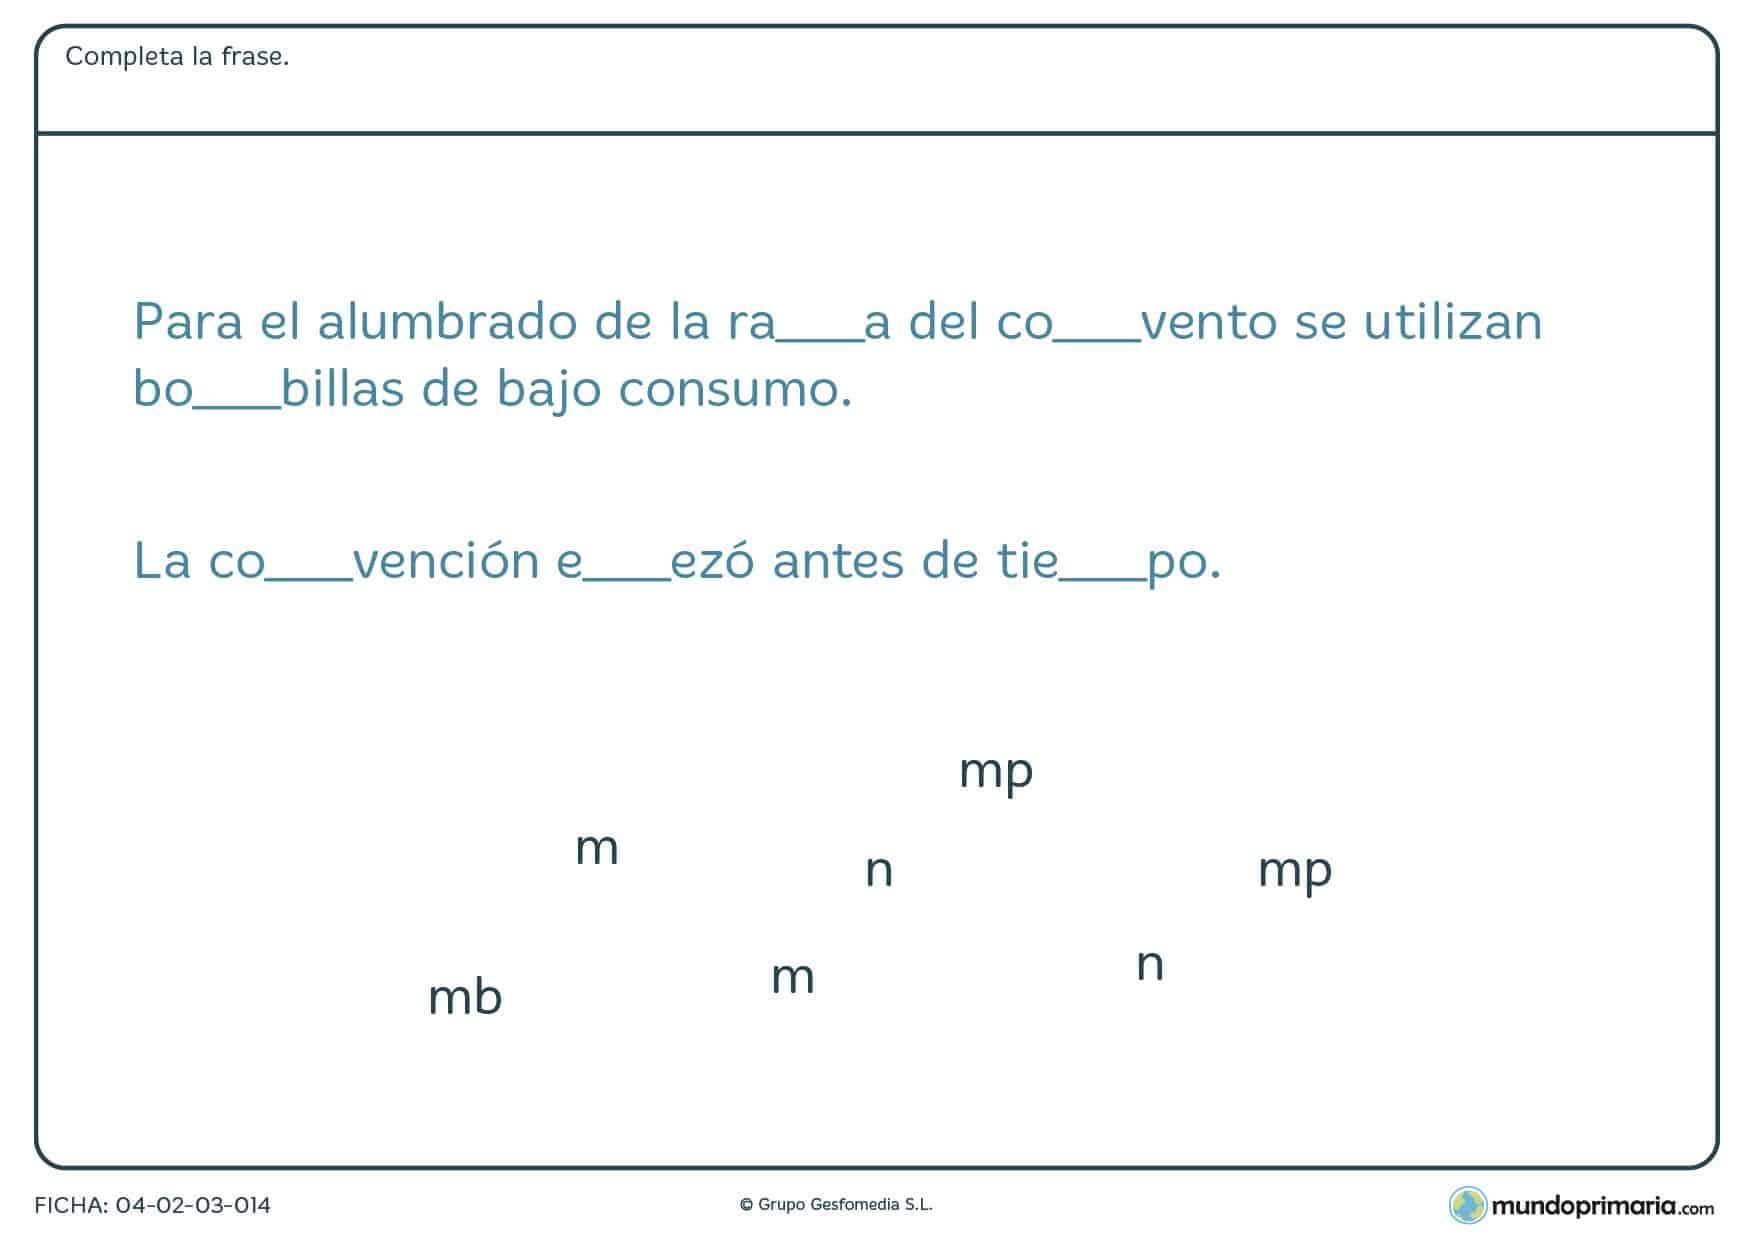 "Ficha de rellenar las palabras con ""mb"" o ""mp"" en la que debes debes completar las palabras con la partícula correcta para que la frase tenga sentido."